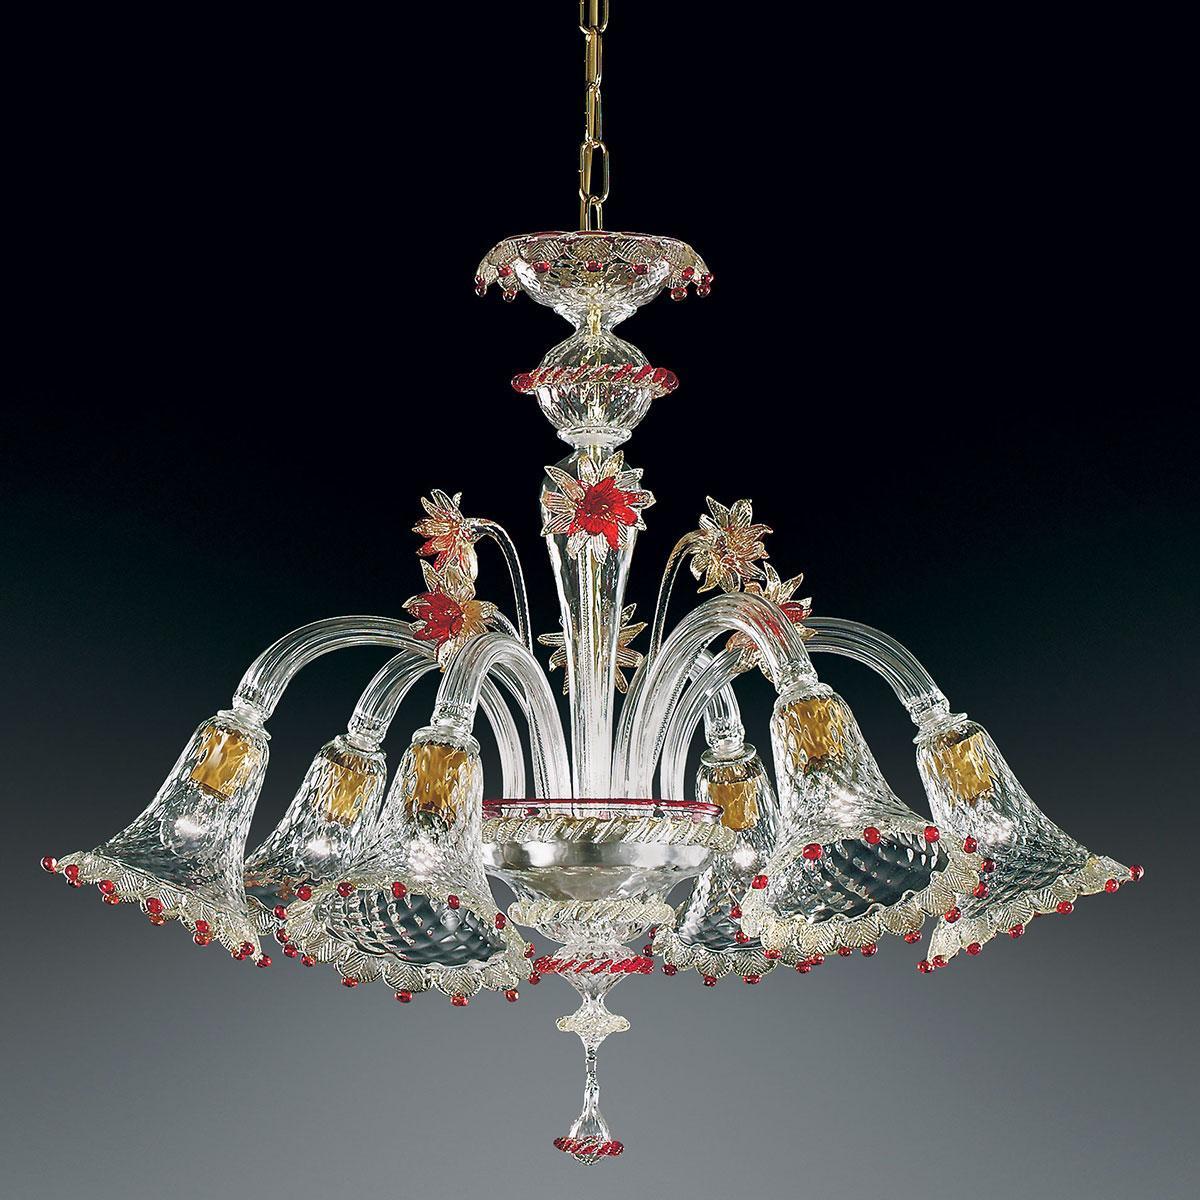 """Rosalba"" Murano glas Kronleuchter - 6 flammig - transparent, gold und rot"